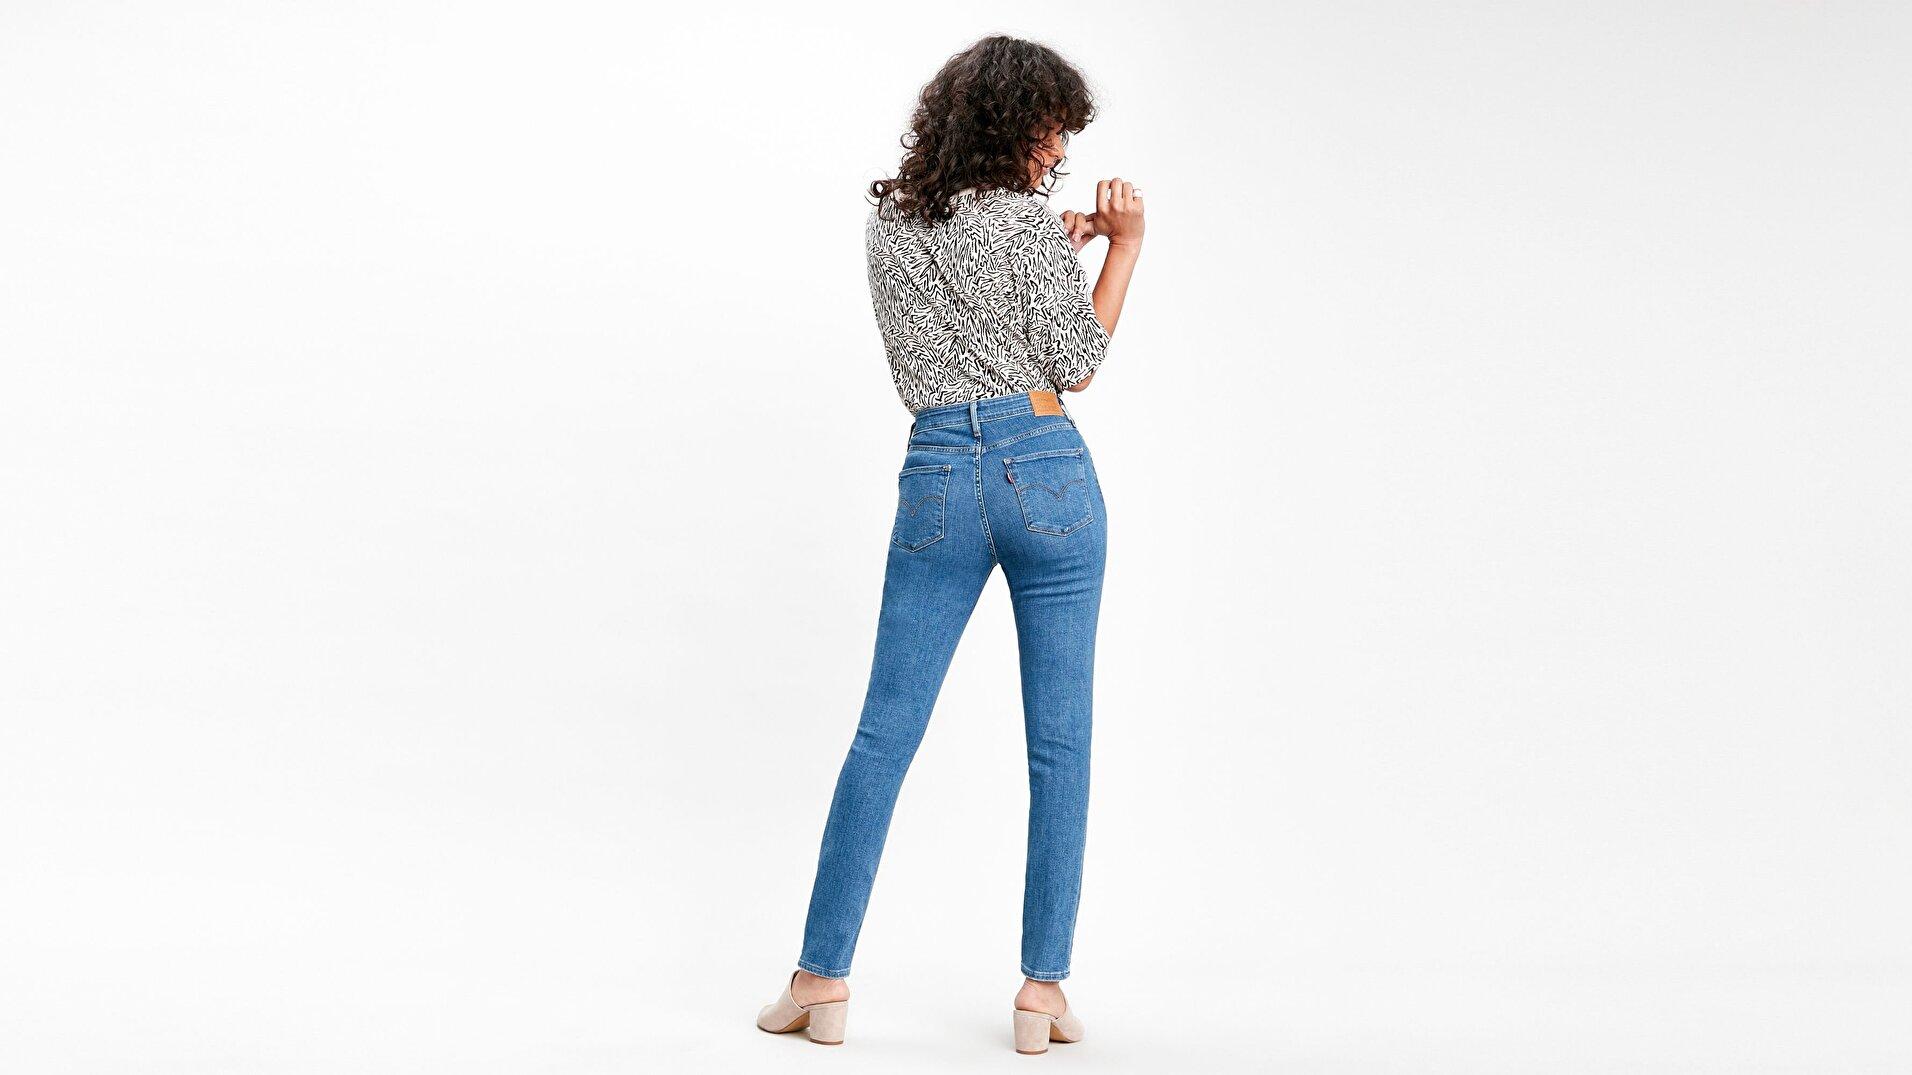 721 Yüksel Bel Skinny Fit Kadın Jean Pantolon-On The Same Page